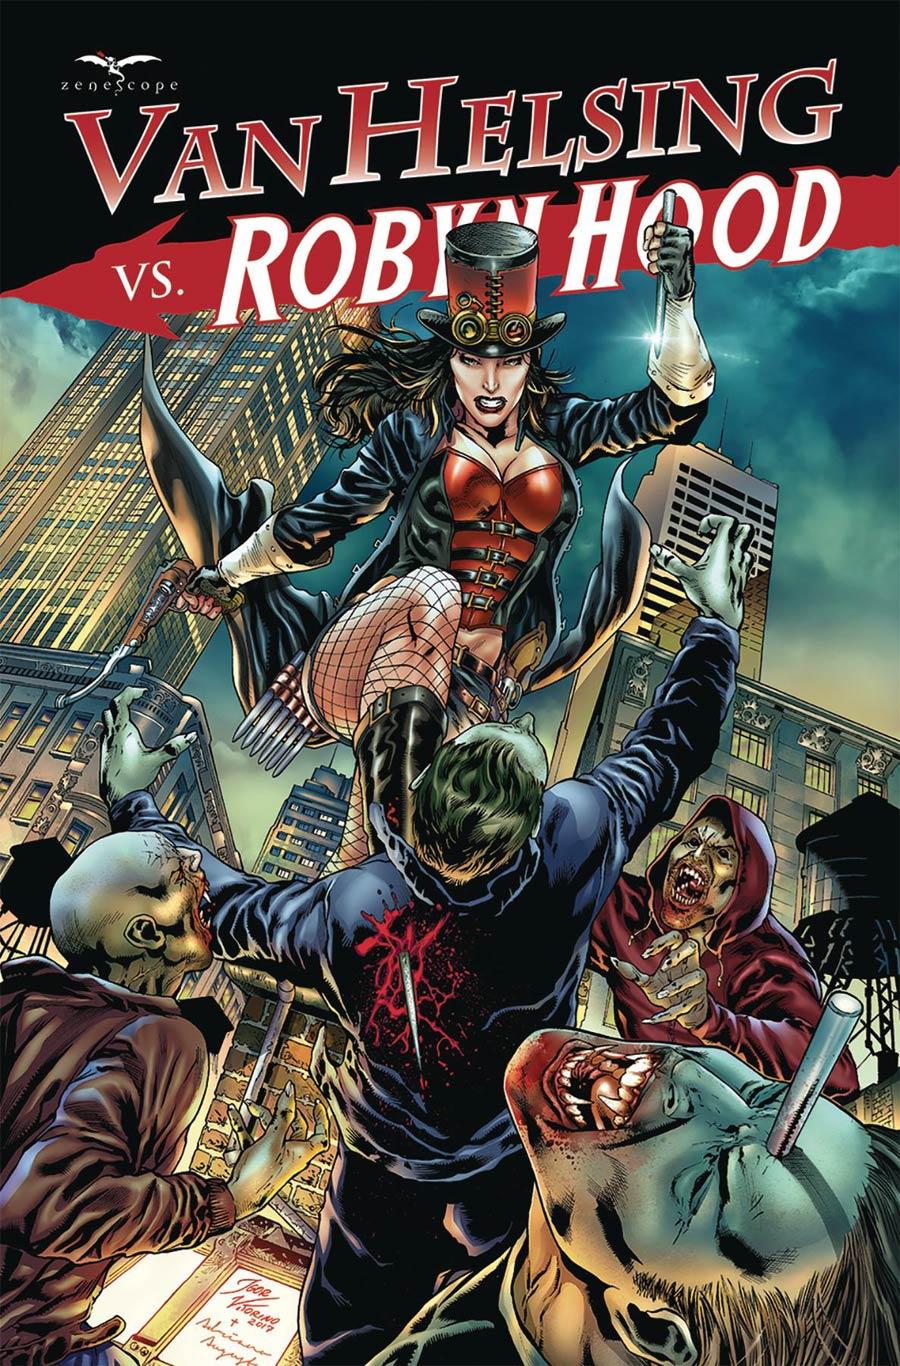 Grimm Fairy Tales Presents Van Helsing vs Robyn Hood #4 Cover B Igor Vitorino